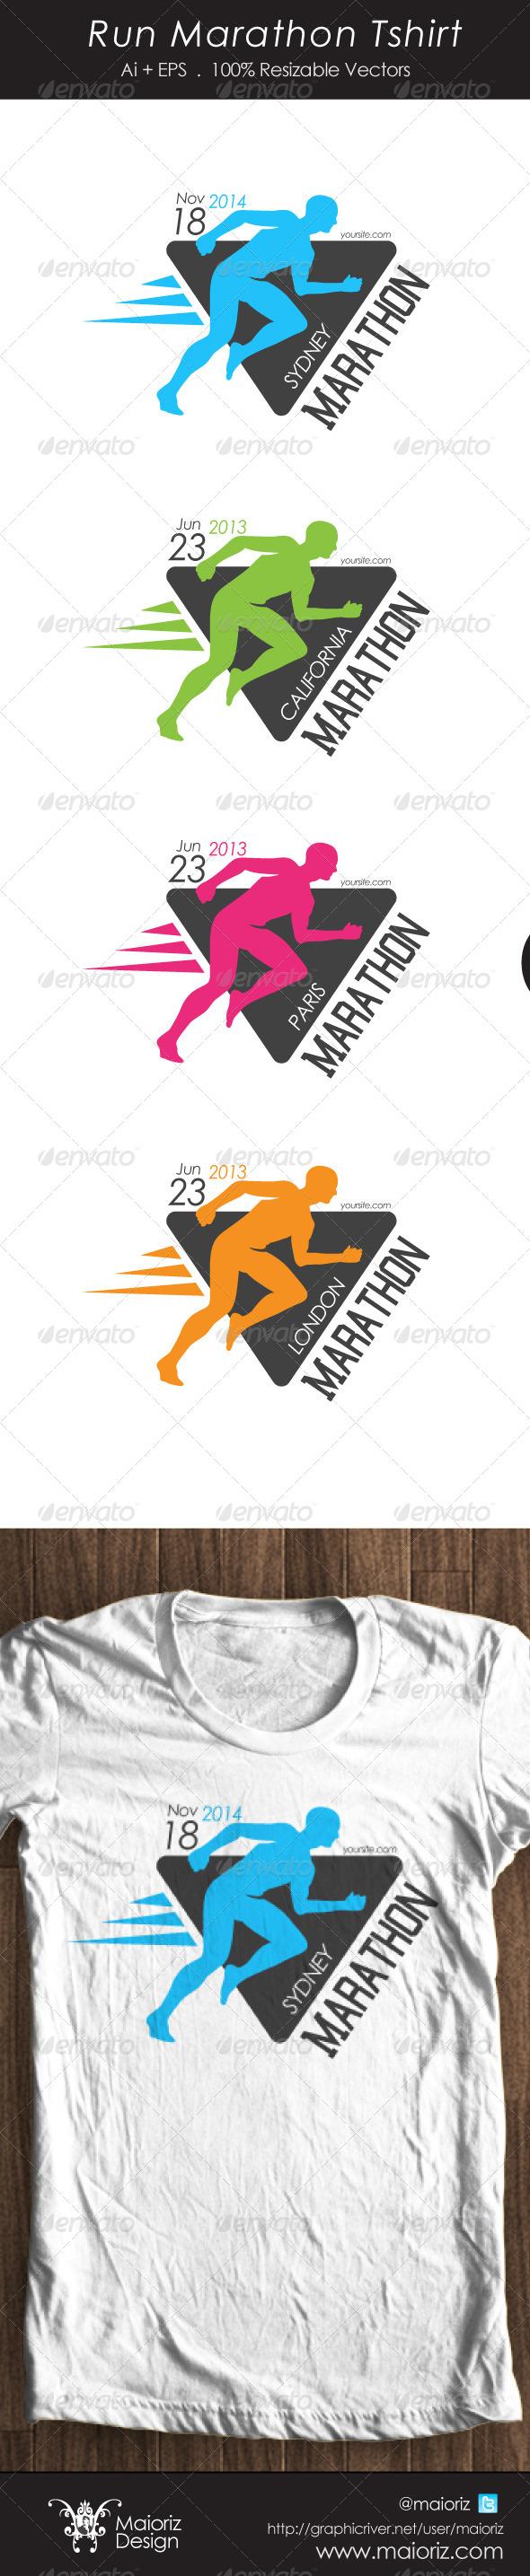 Run Marathon Tshirt - Events T-Shirts